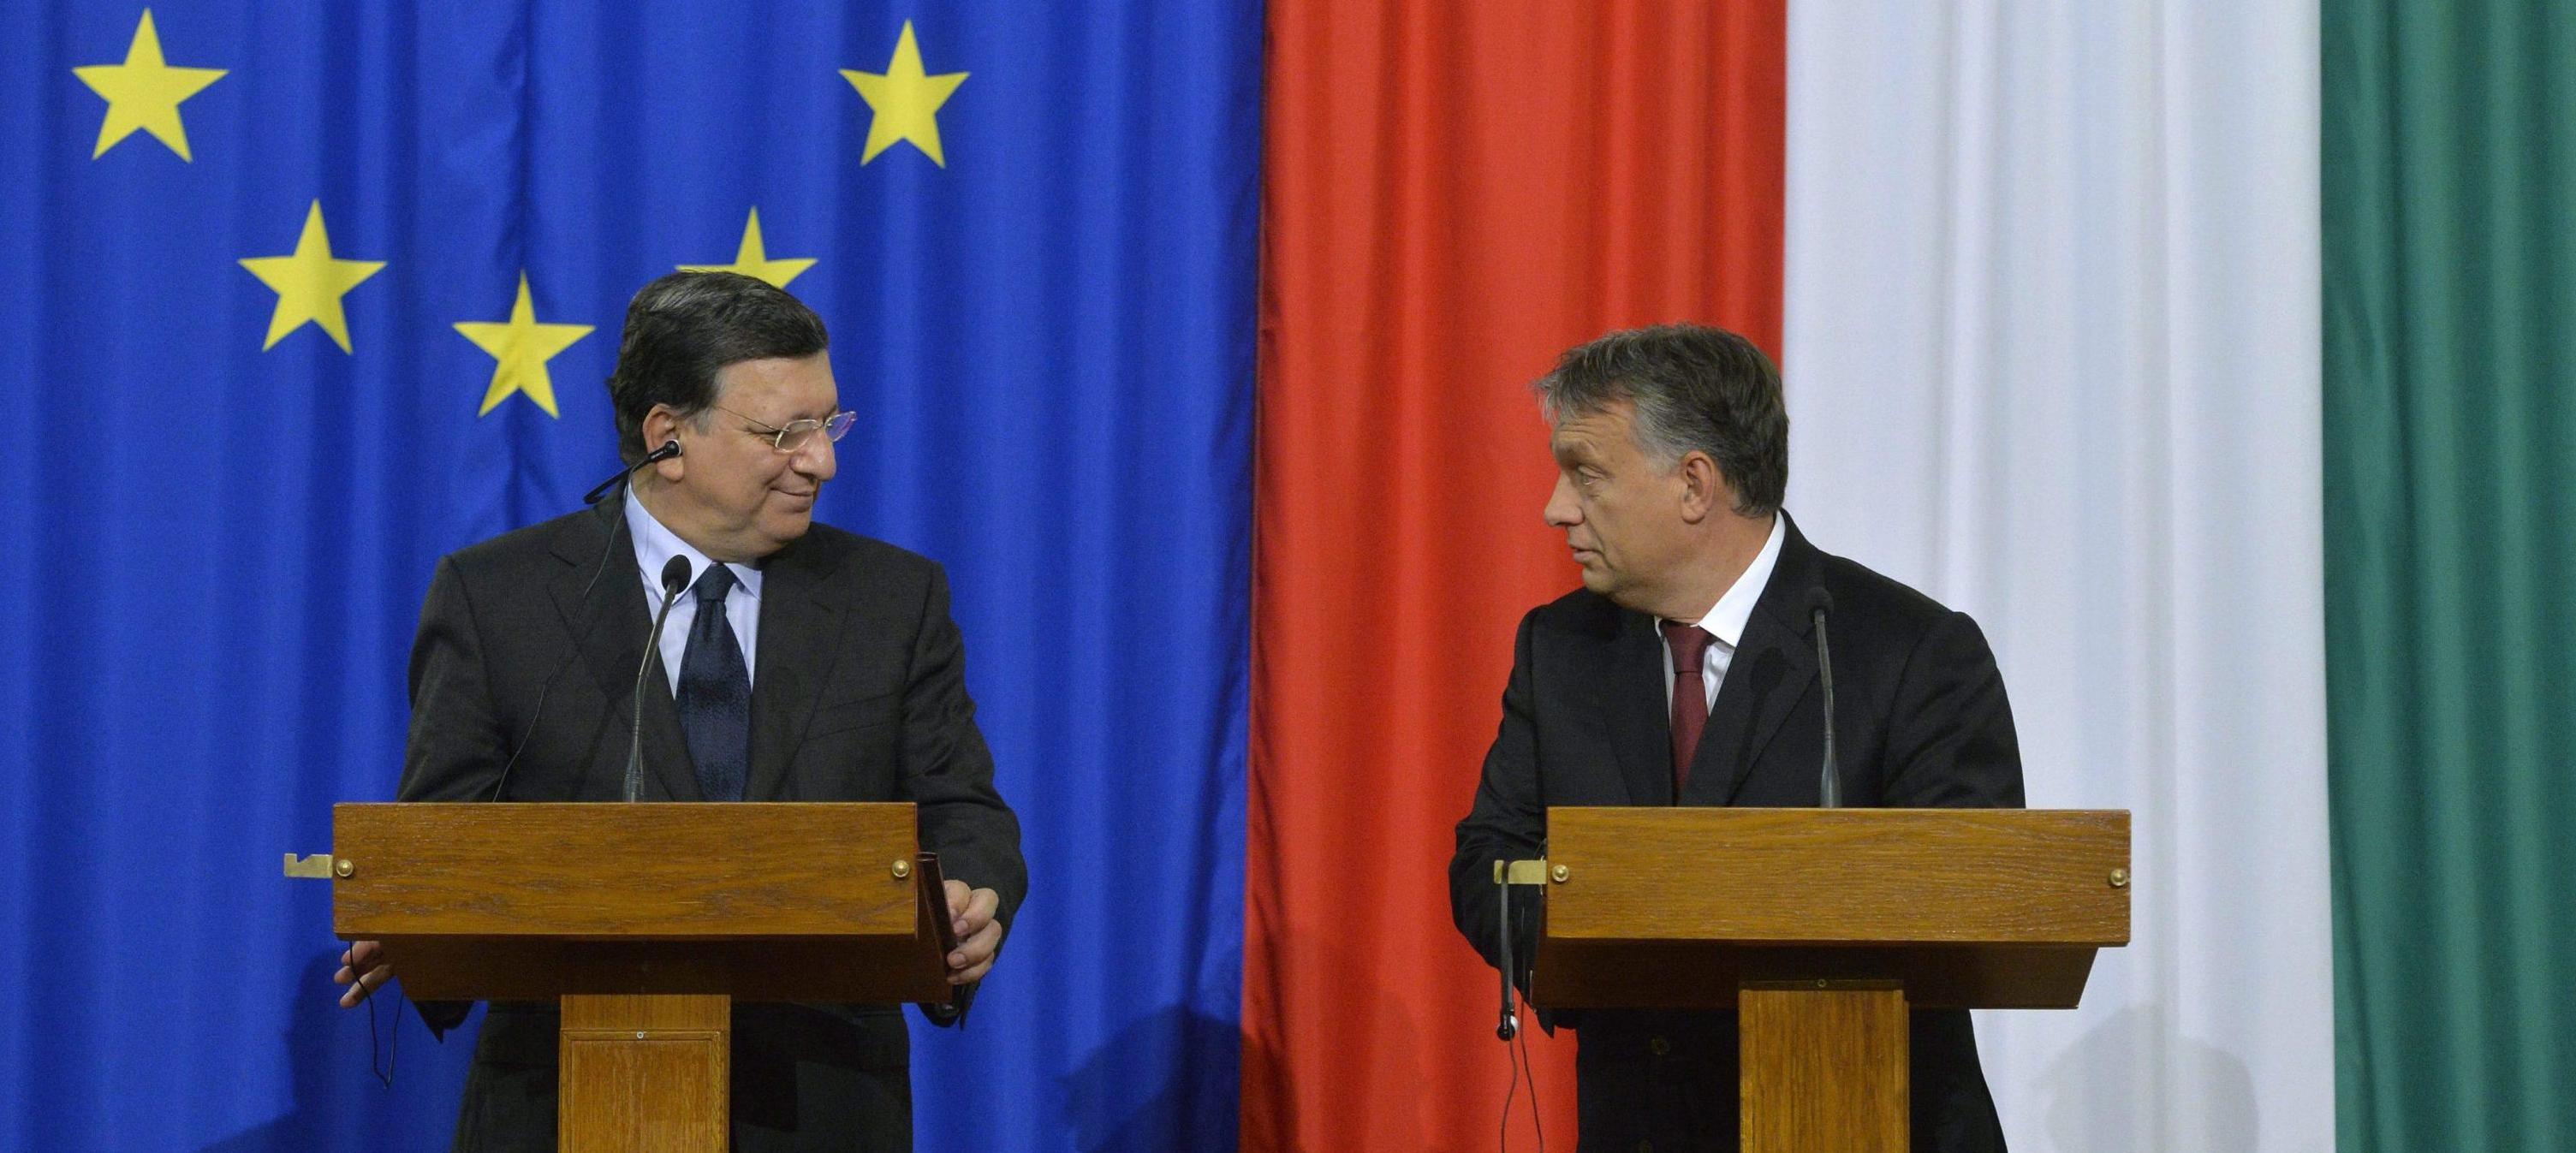 Orban e Barroso